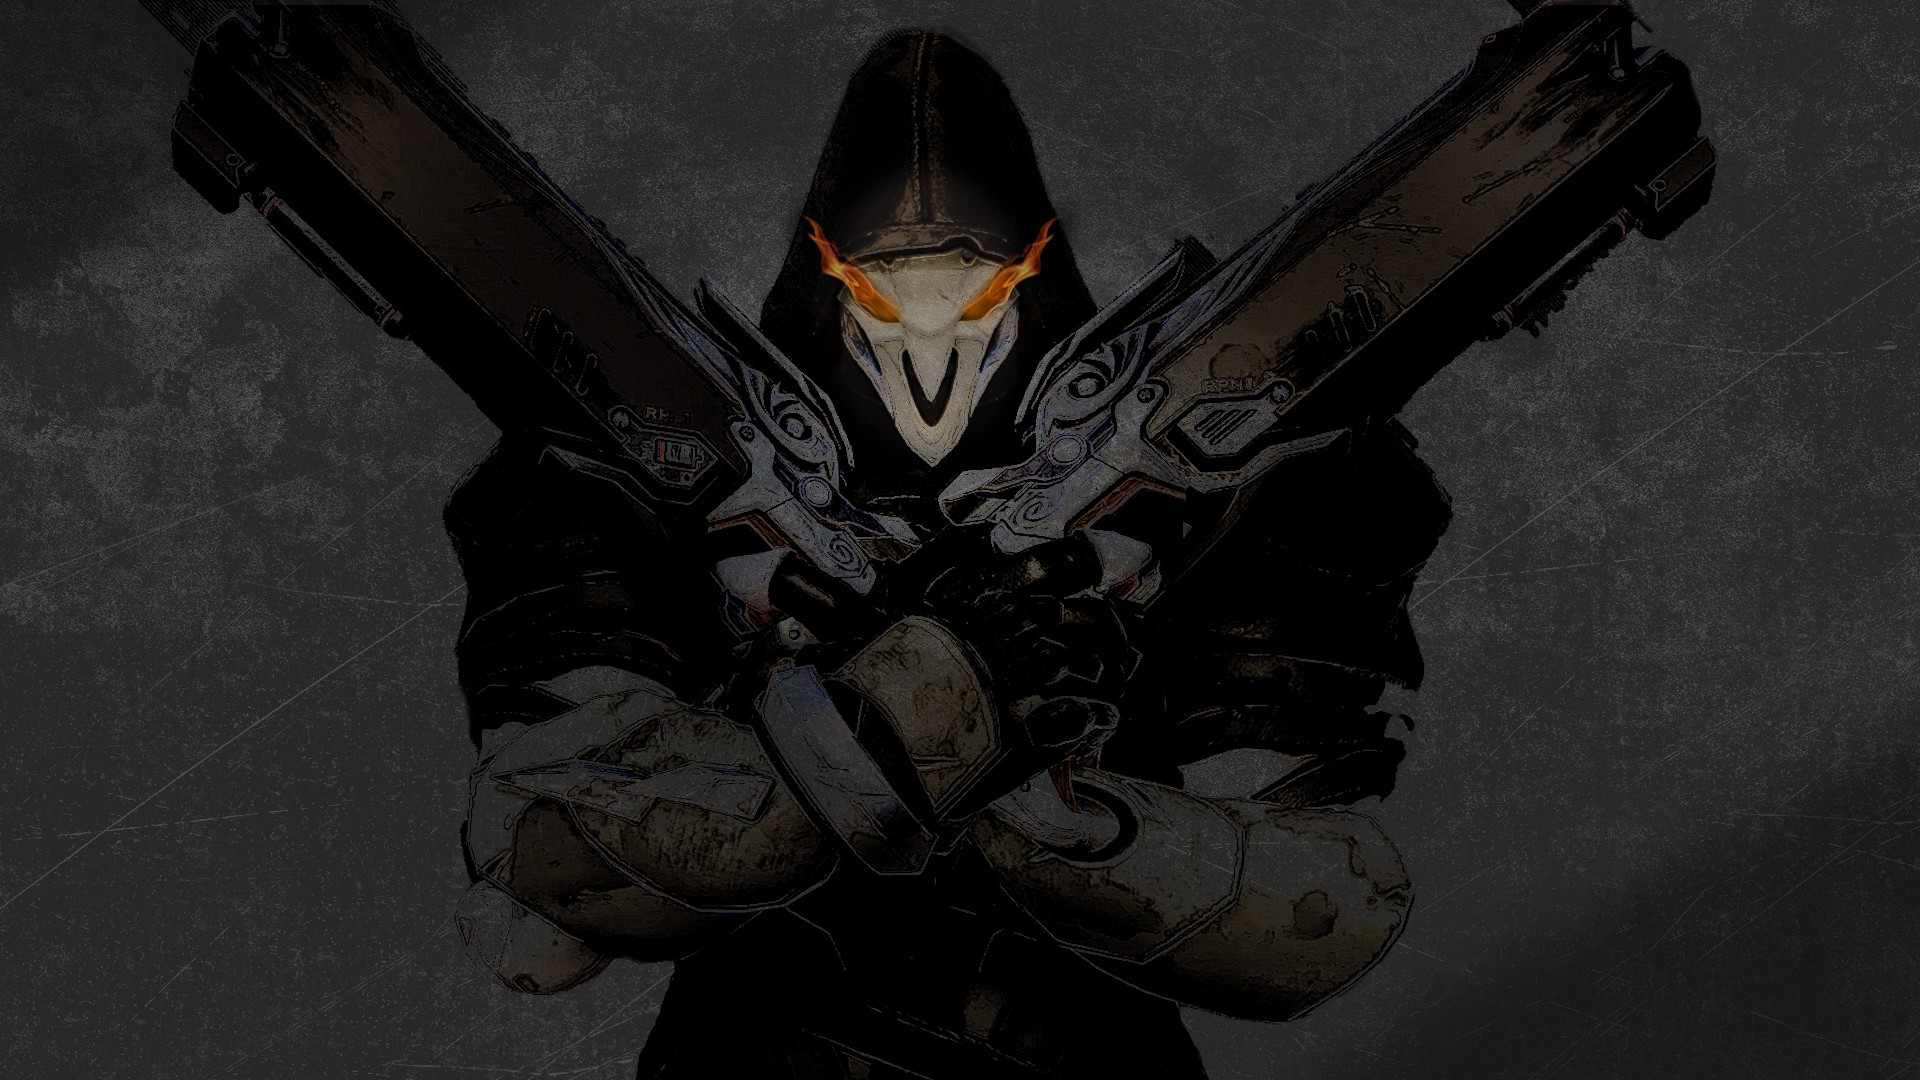 Reaper Overwatch Wallpaper ·① Download Free Amazing Full